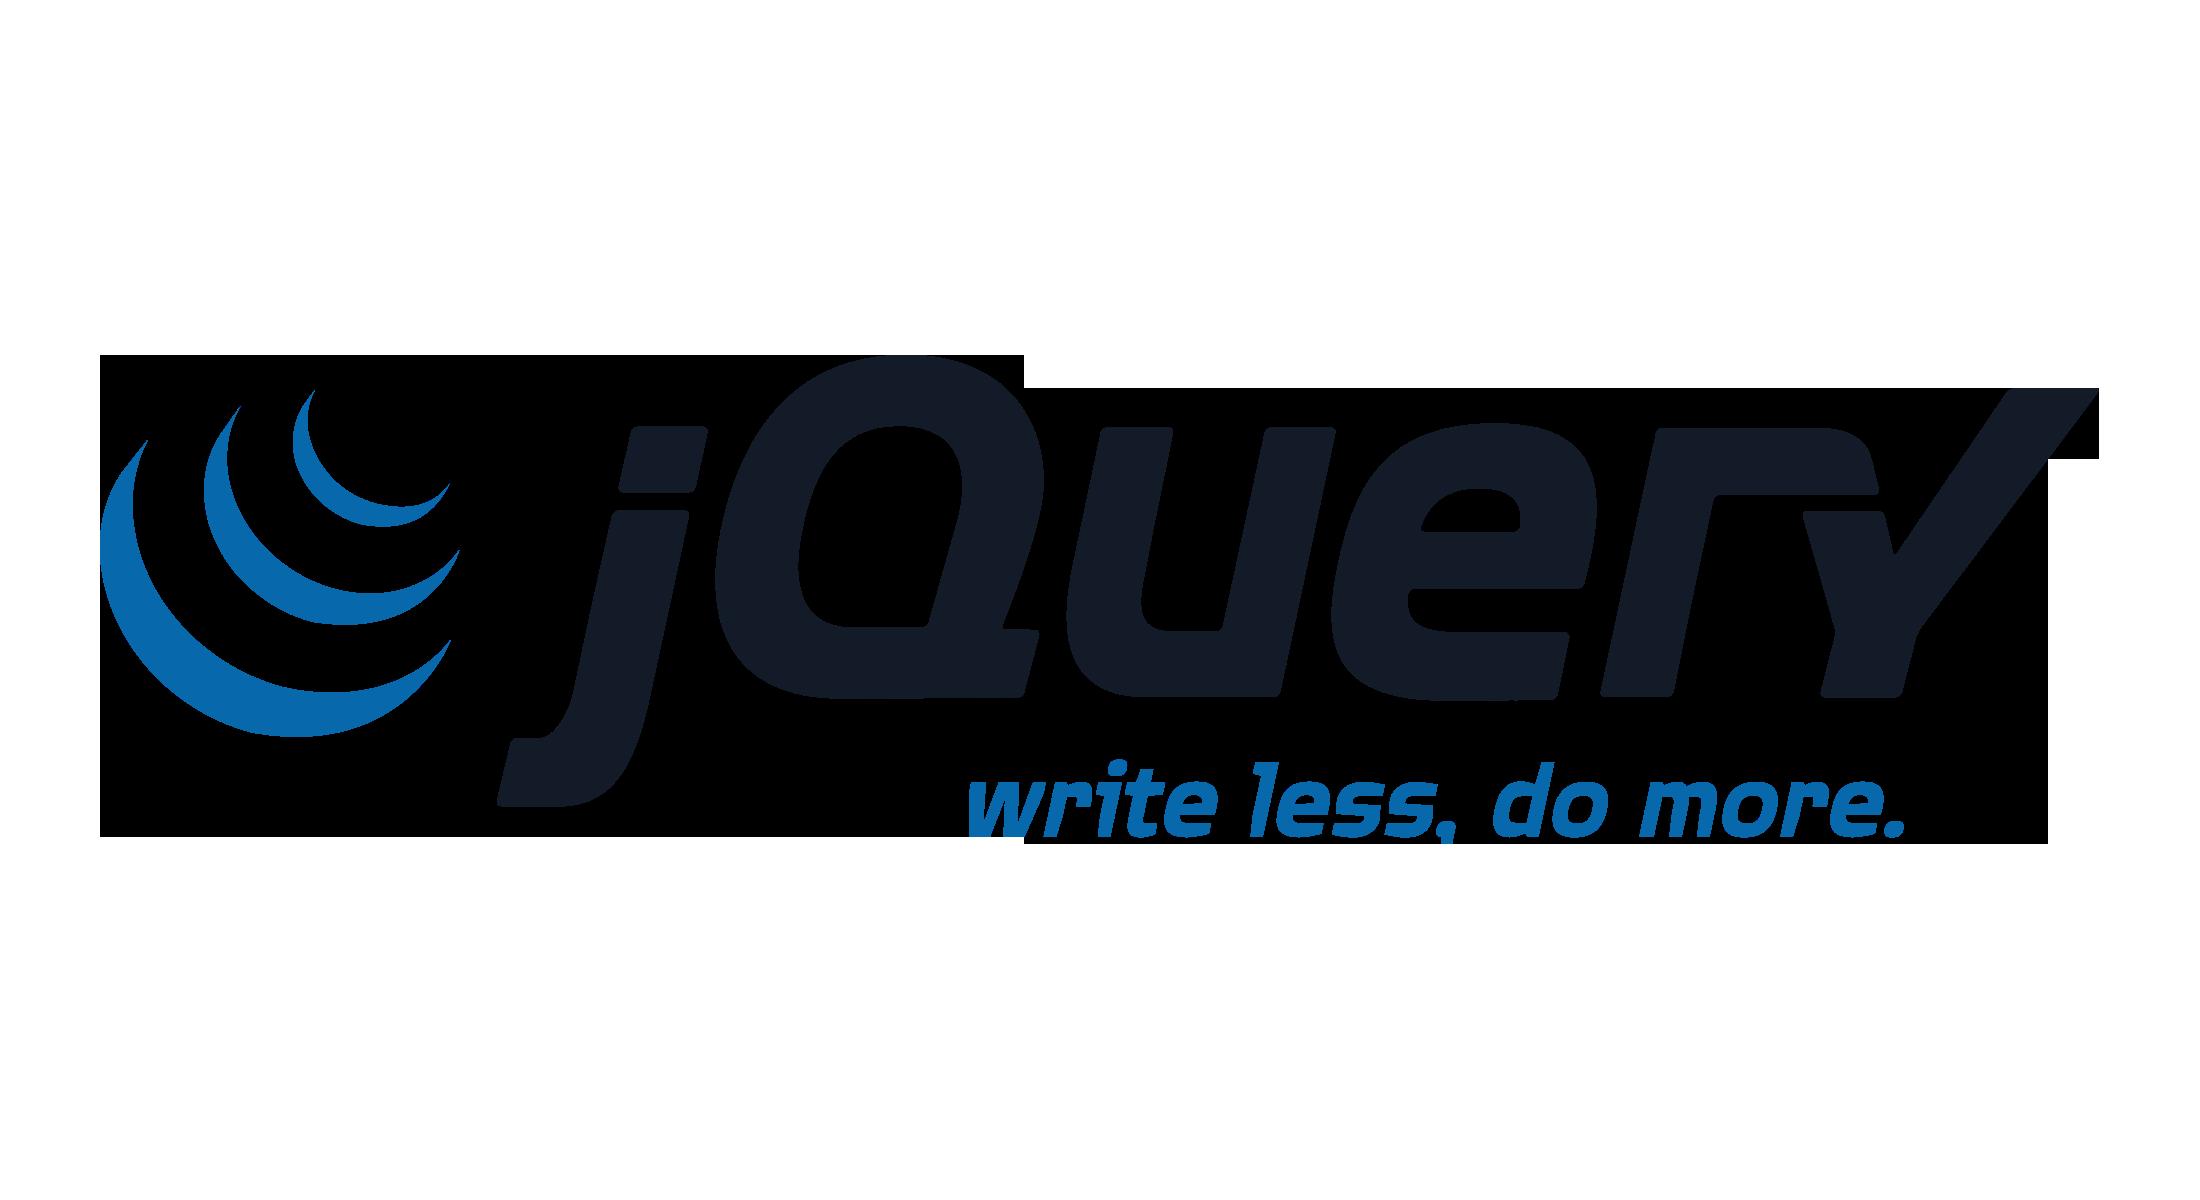 jquery 1.7.2